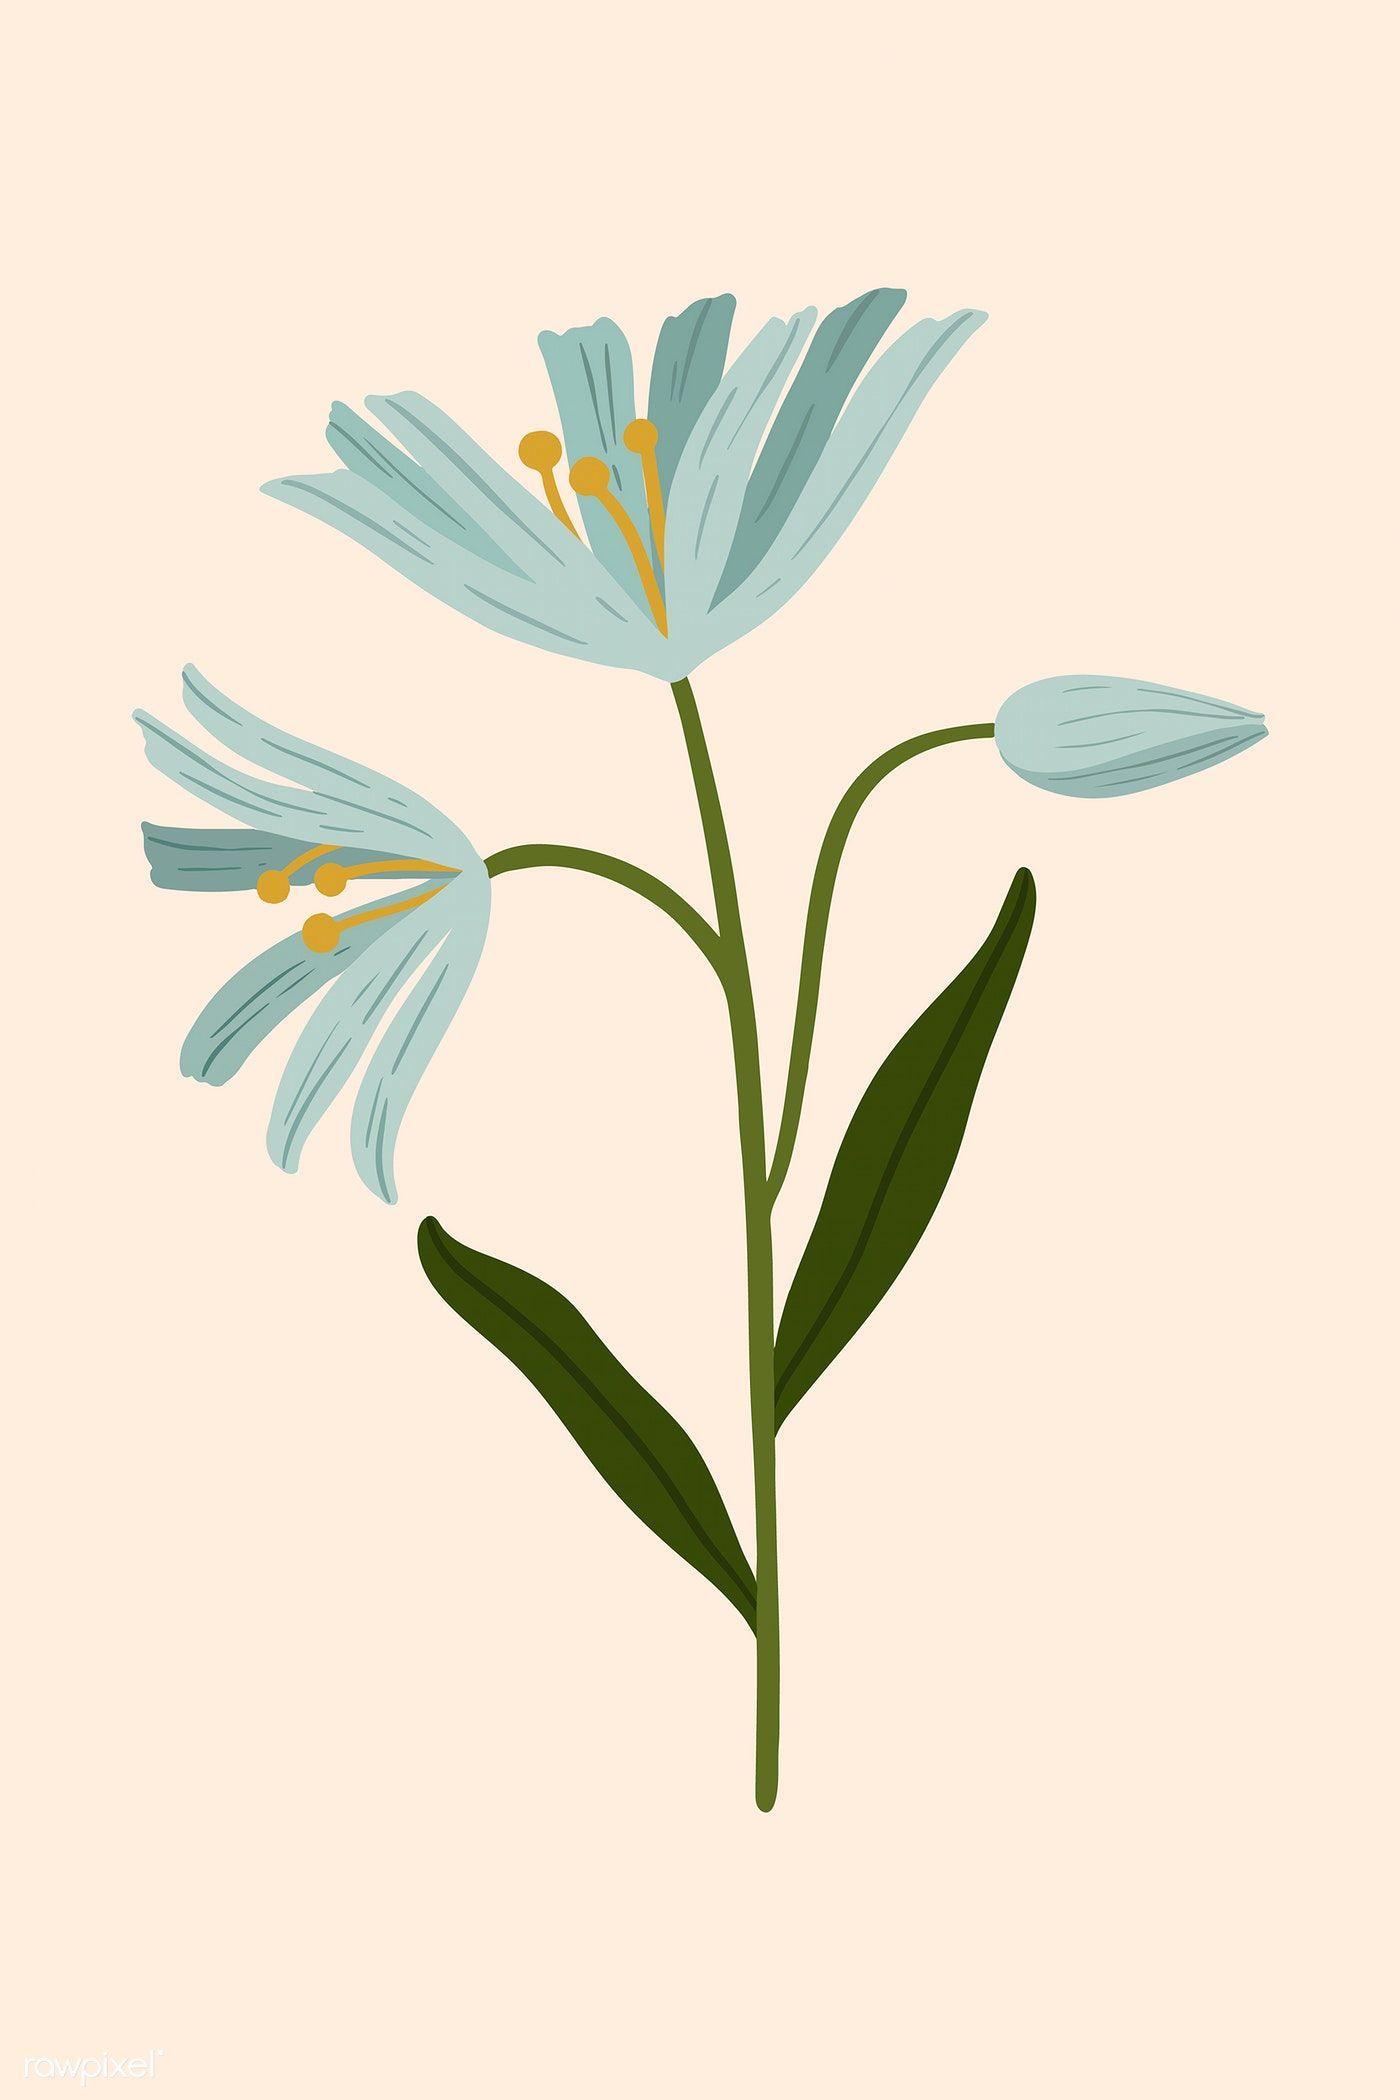 Download free illustration of Blue botanical on a nude background 2022474